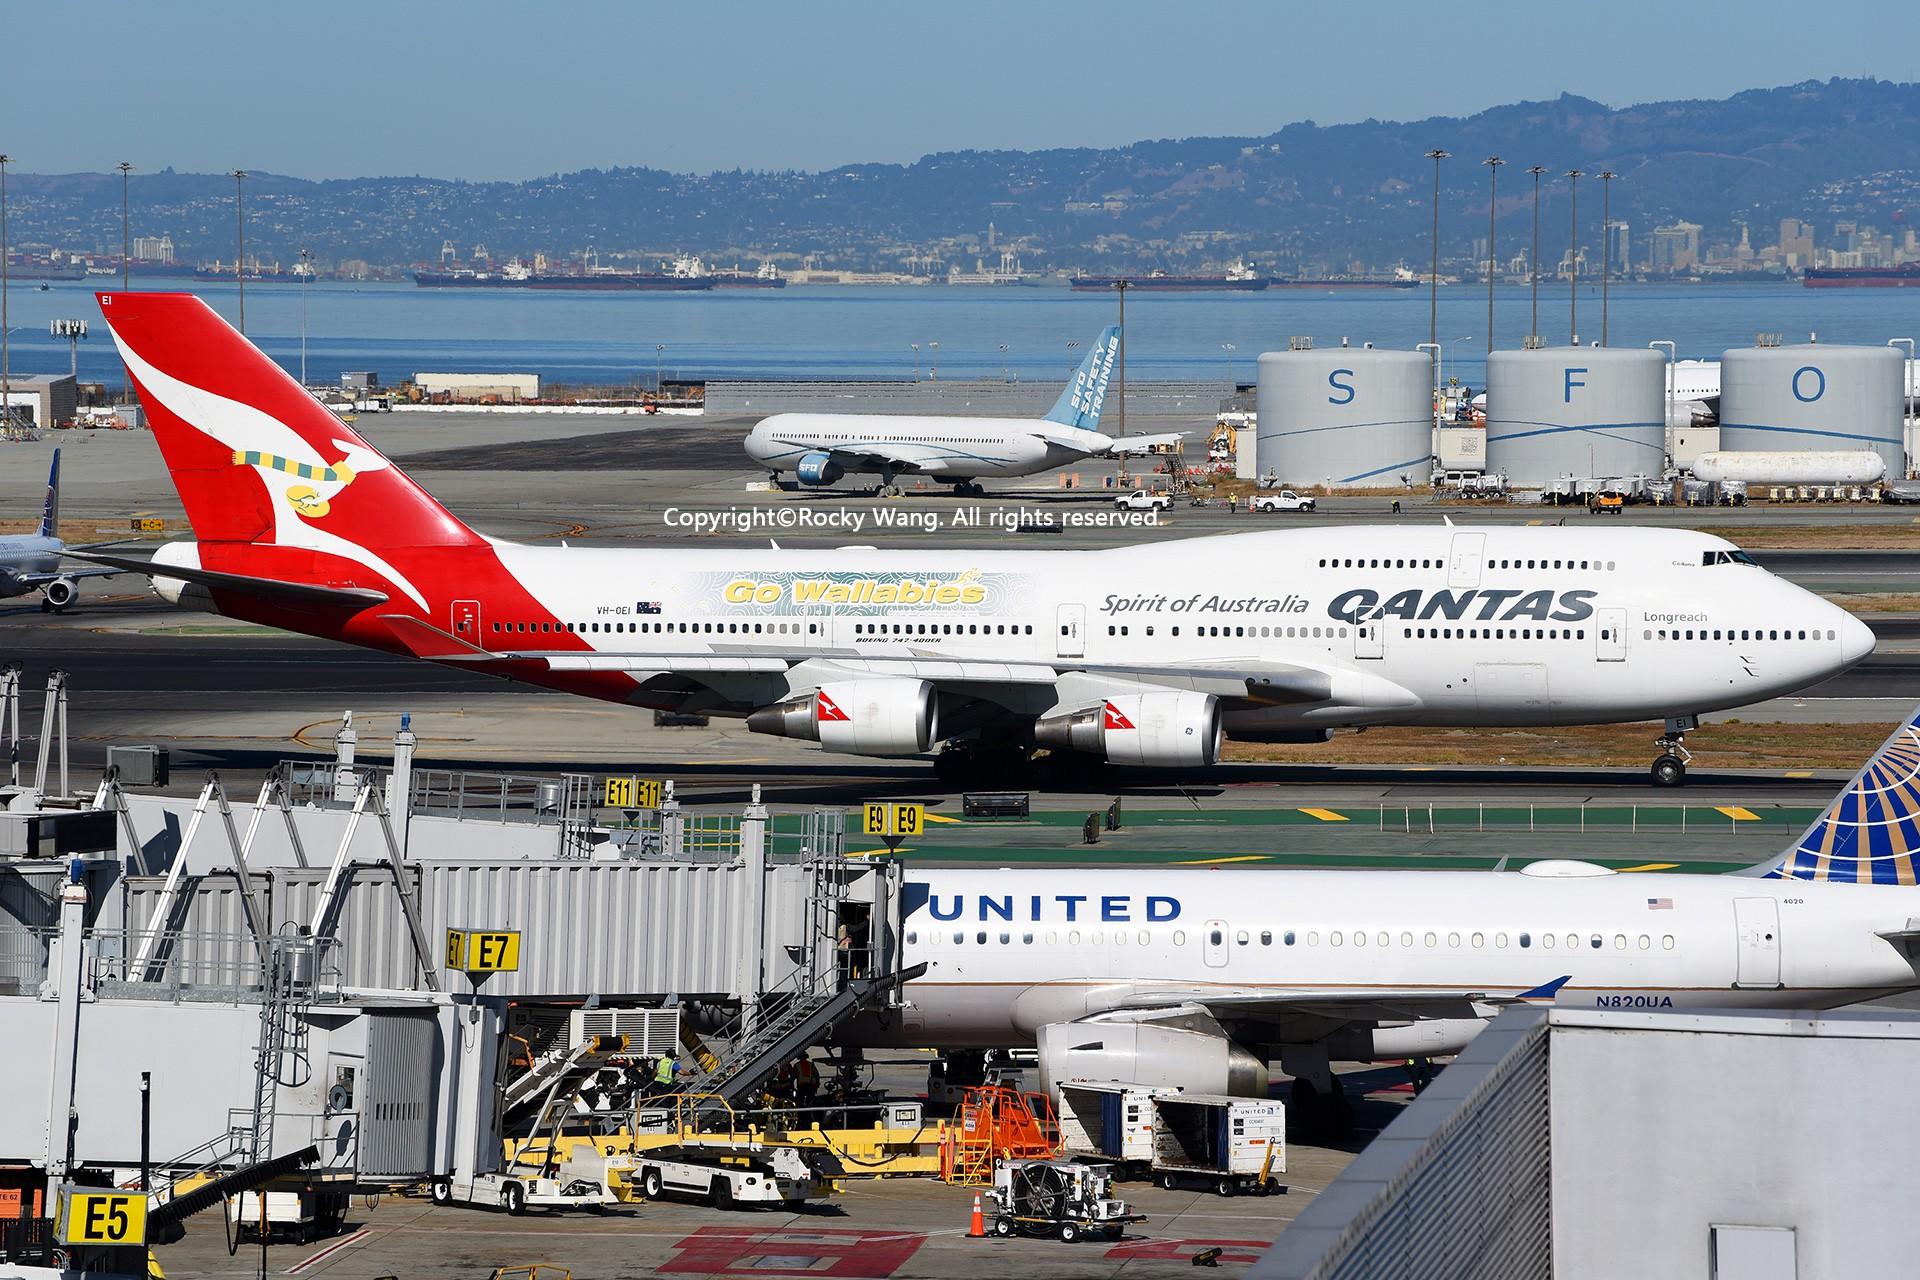 Re:[原创]彩绘圣地-附加彩蛋 BOEING 747-438ER VH-OEI San Francisco Int'l Airport